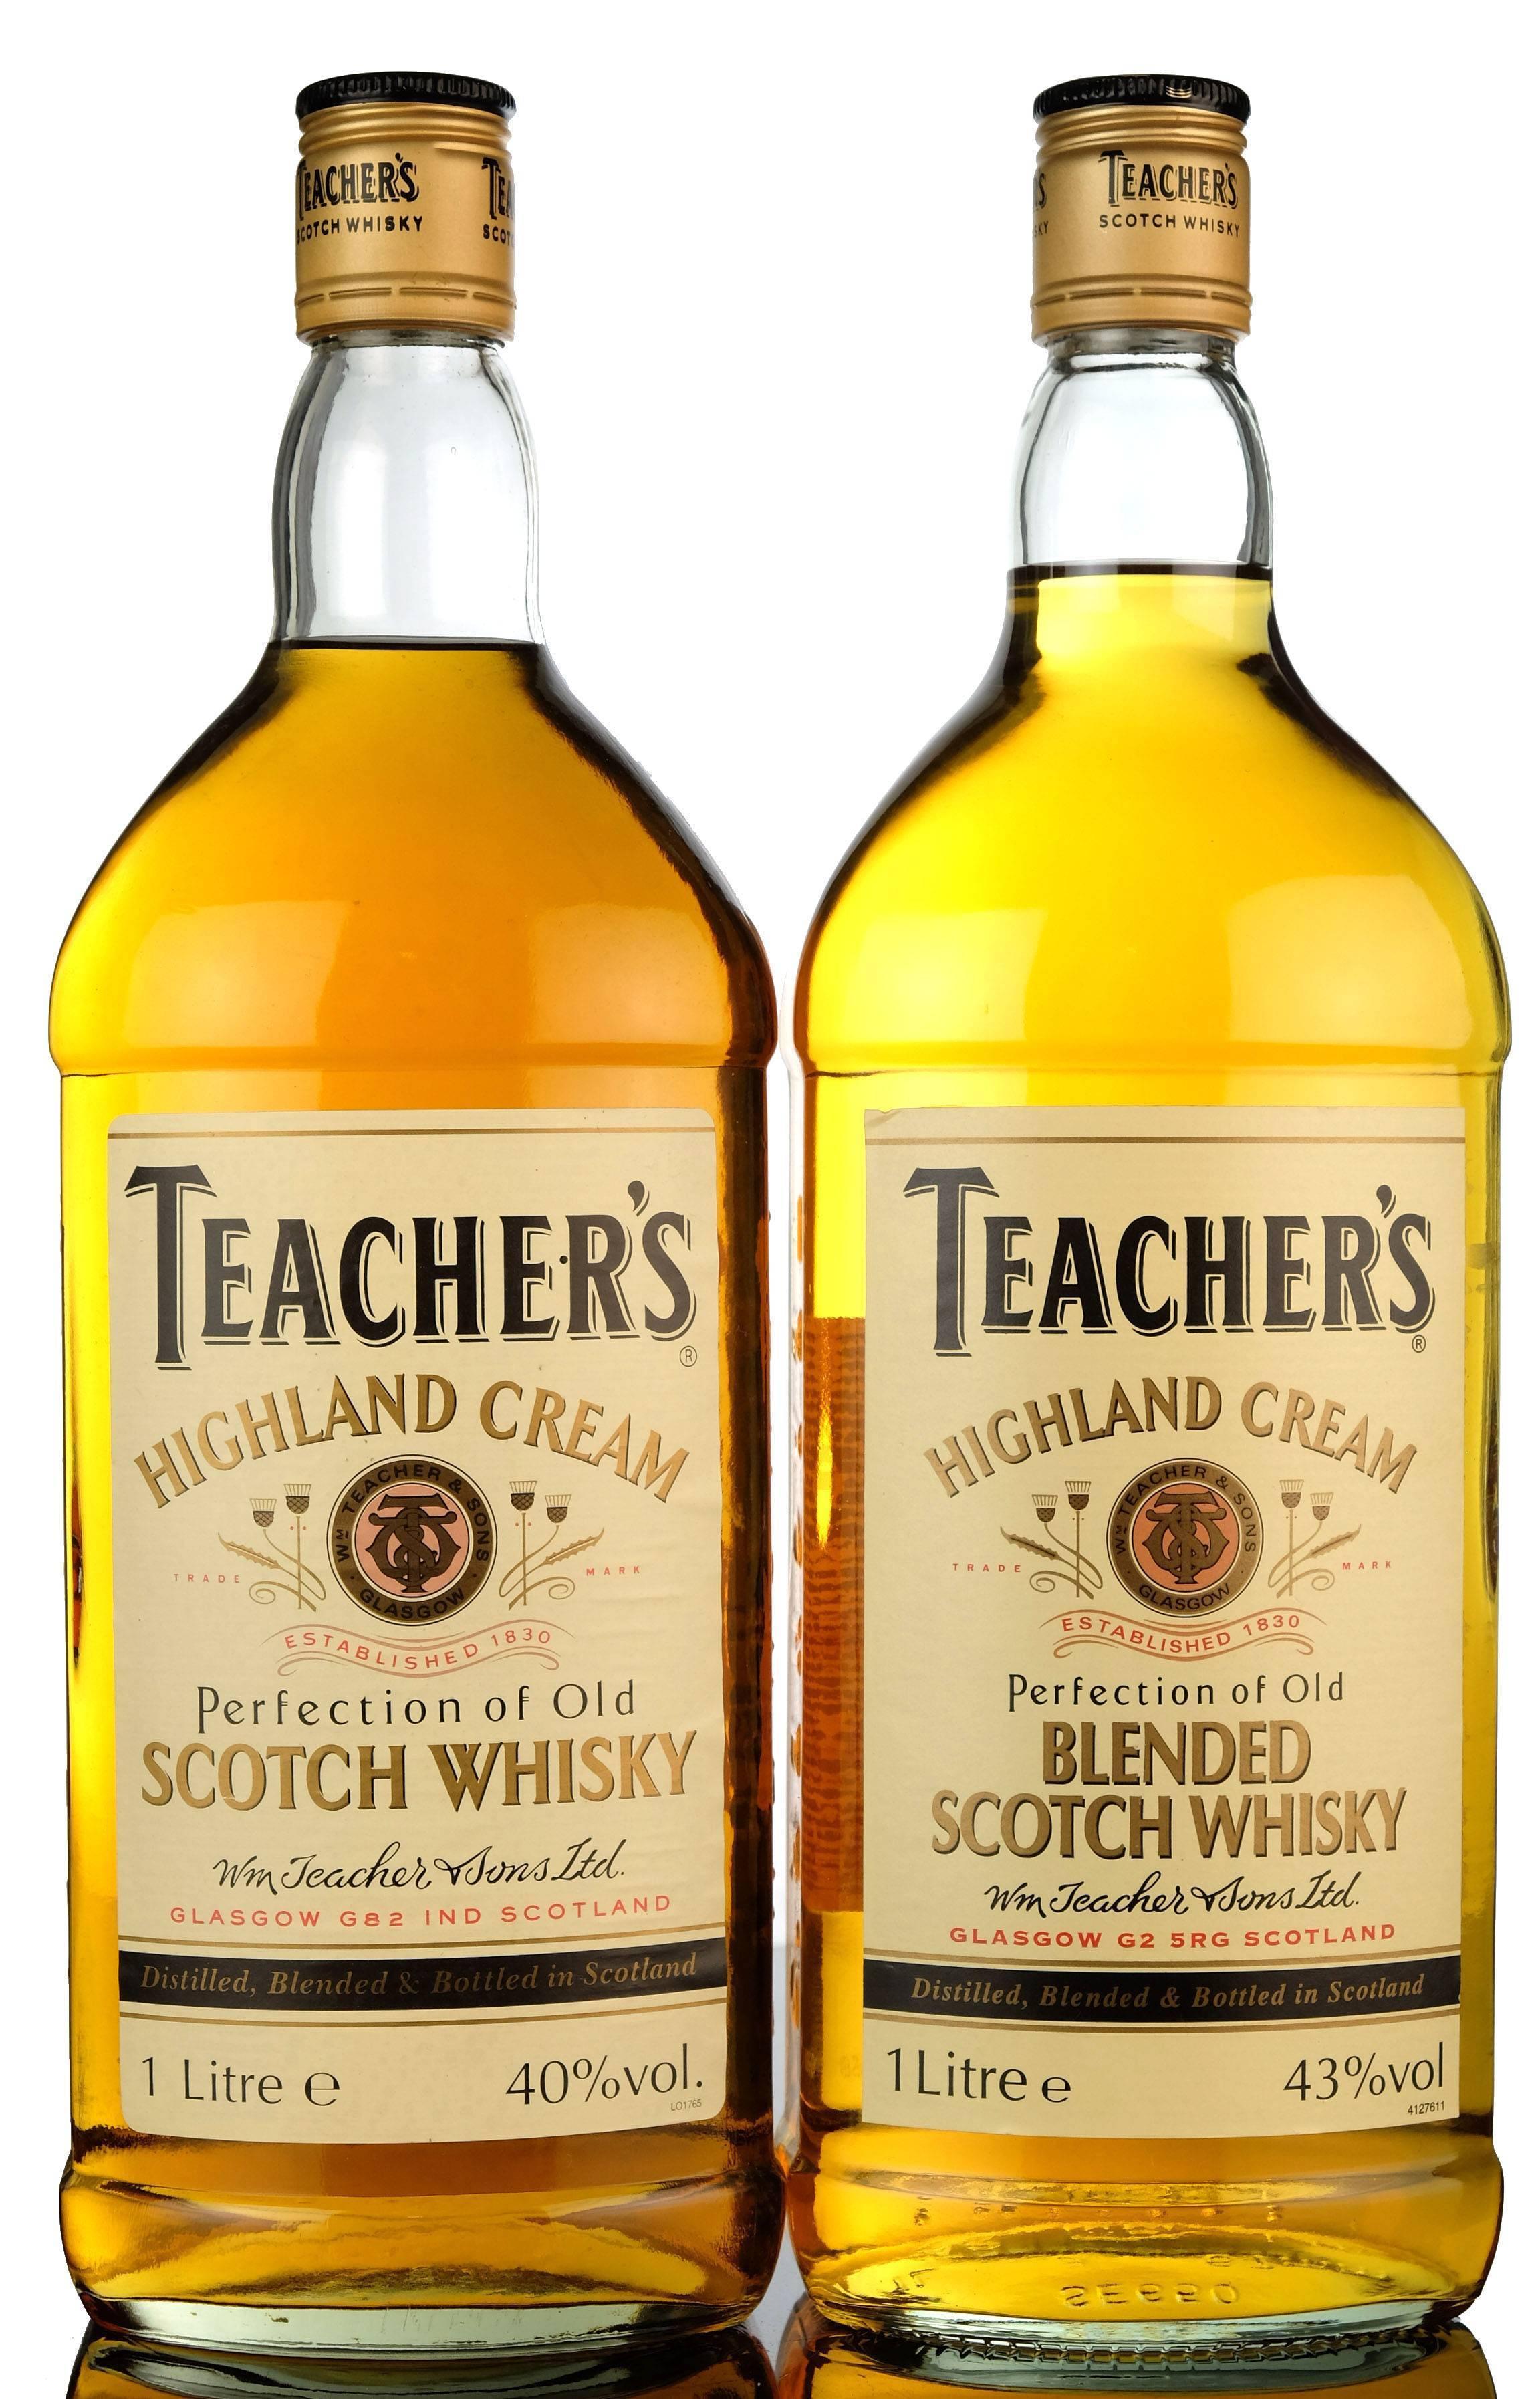 Виски тичерс хайленд крим и другие сорта: история создания бренда, характеристики teachers highland cream и иных представителей линейки, цена за 0,5, 0,75 и 1 литр | mosspravki.ru